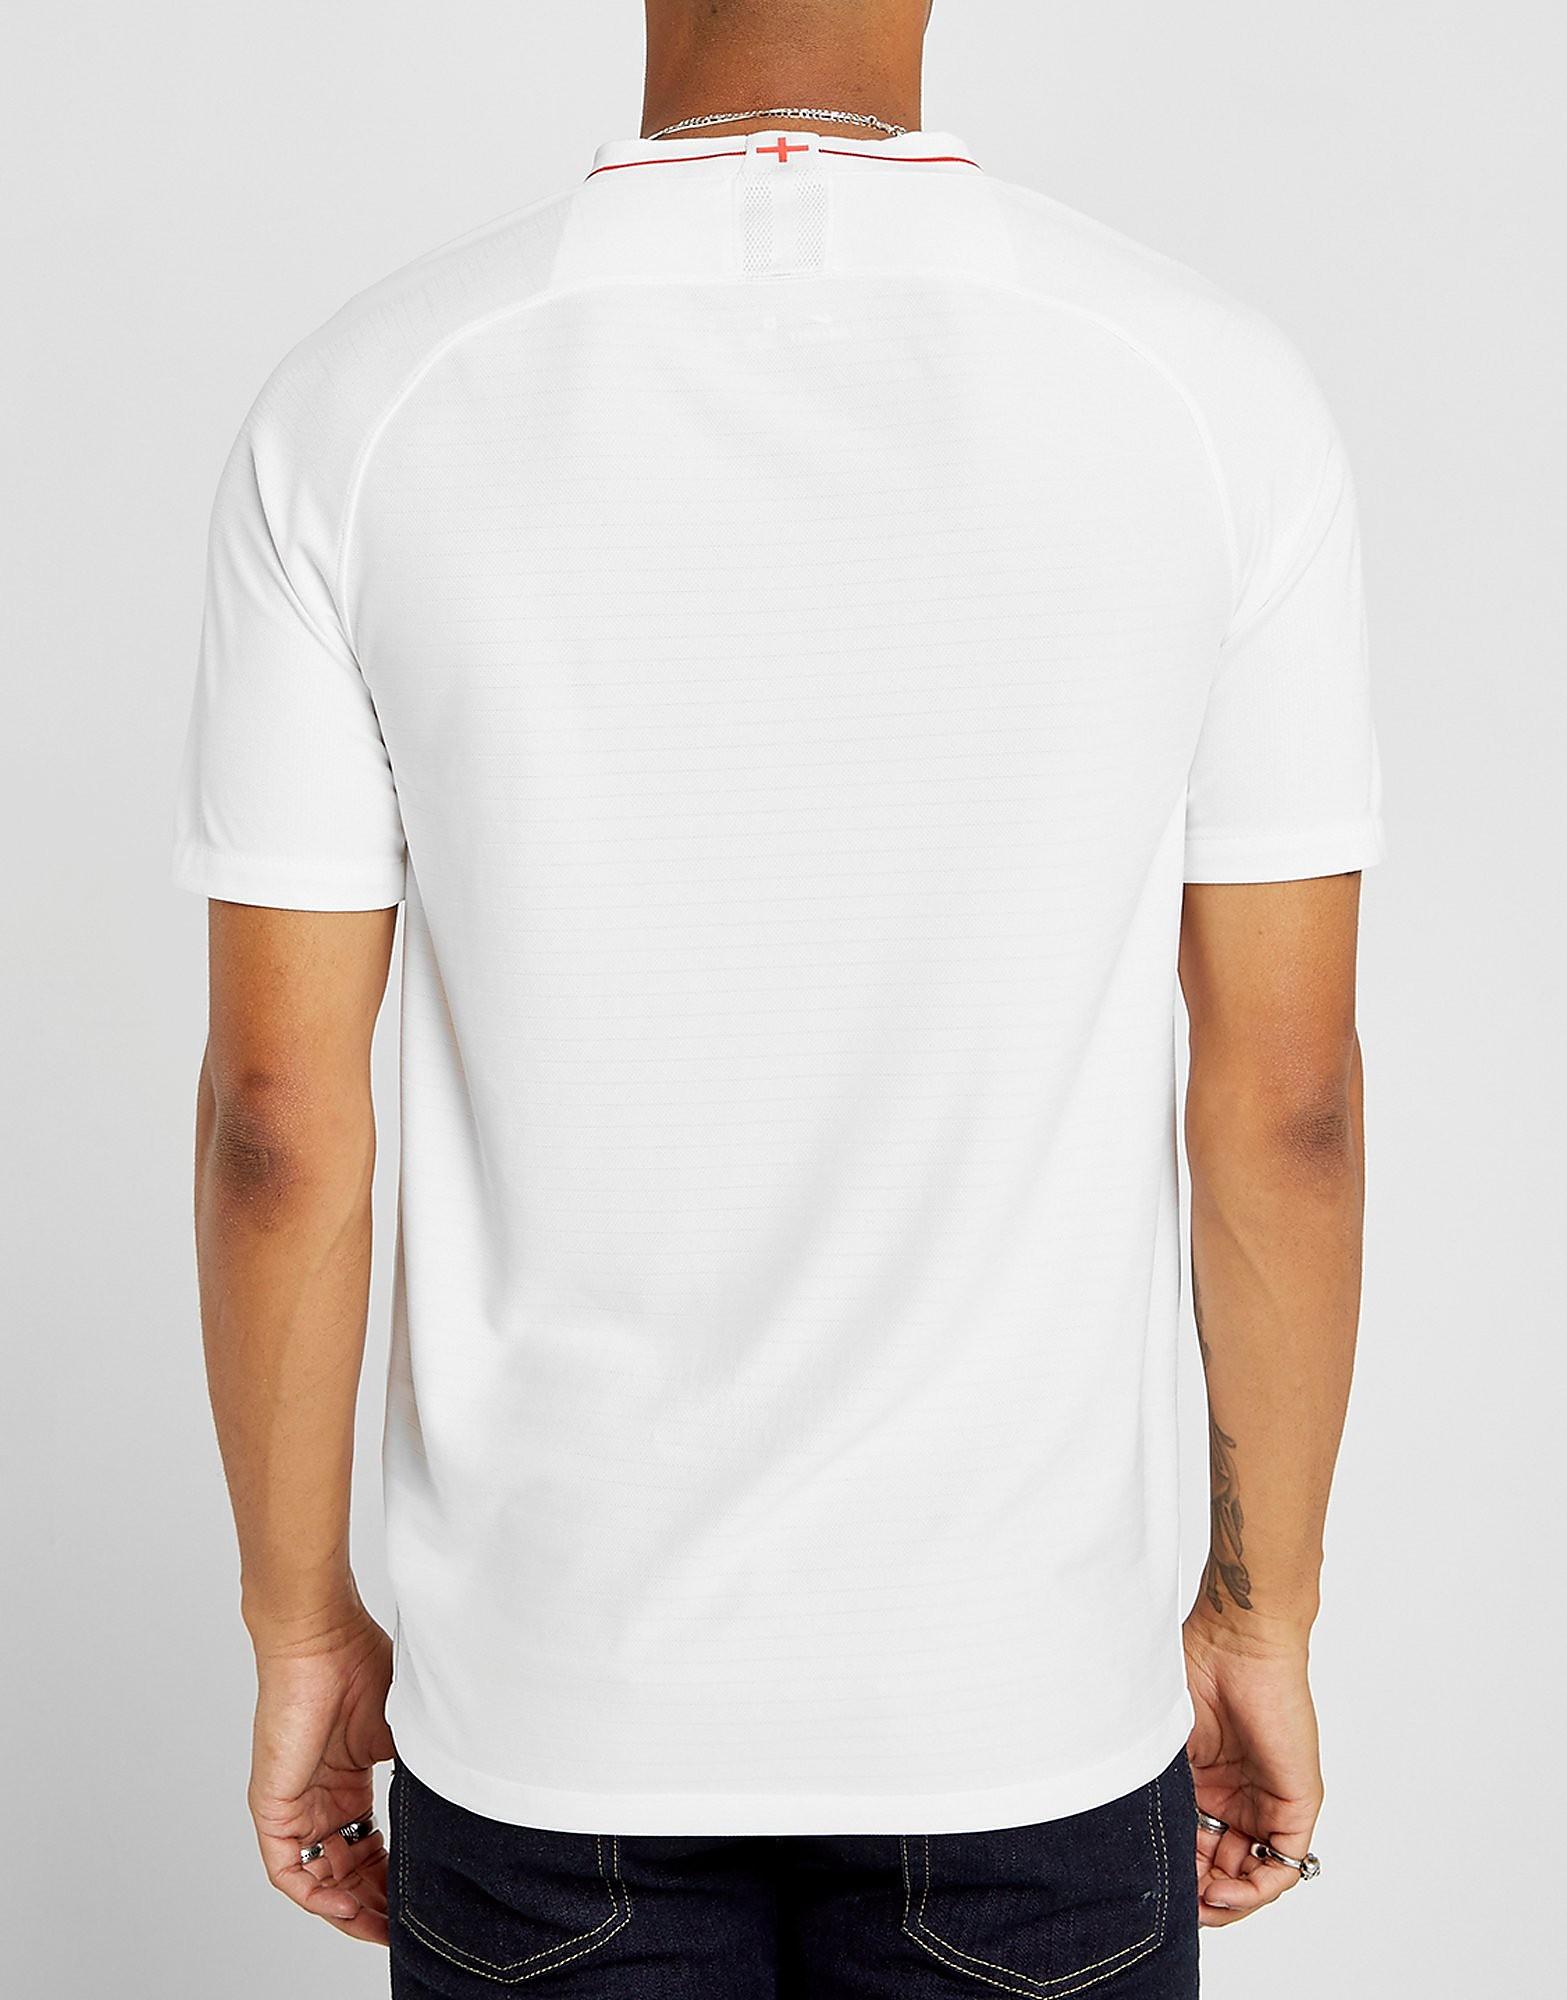 Nike England 2018 Home Shirt